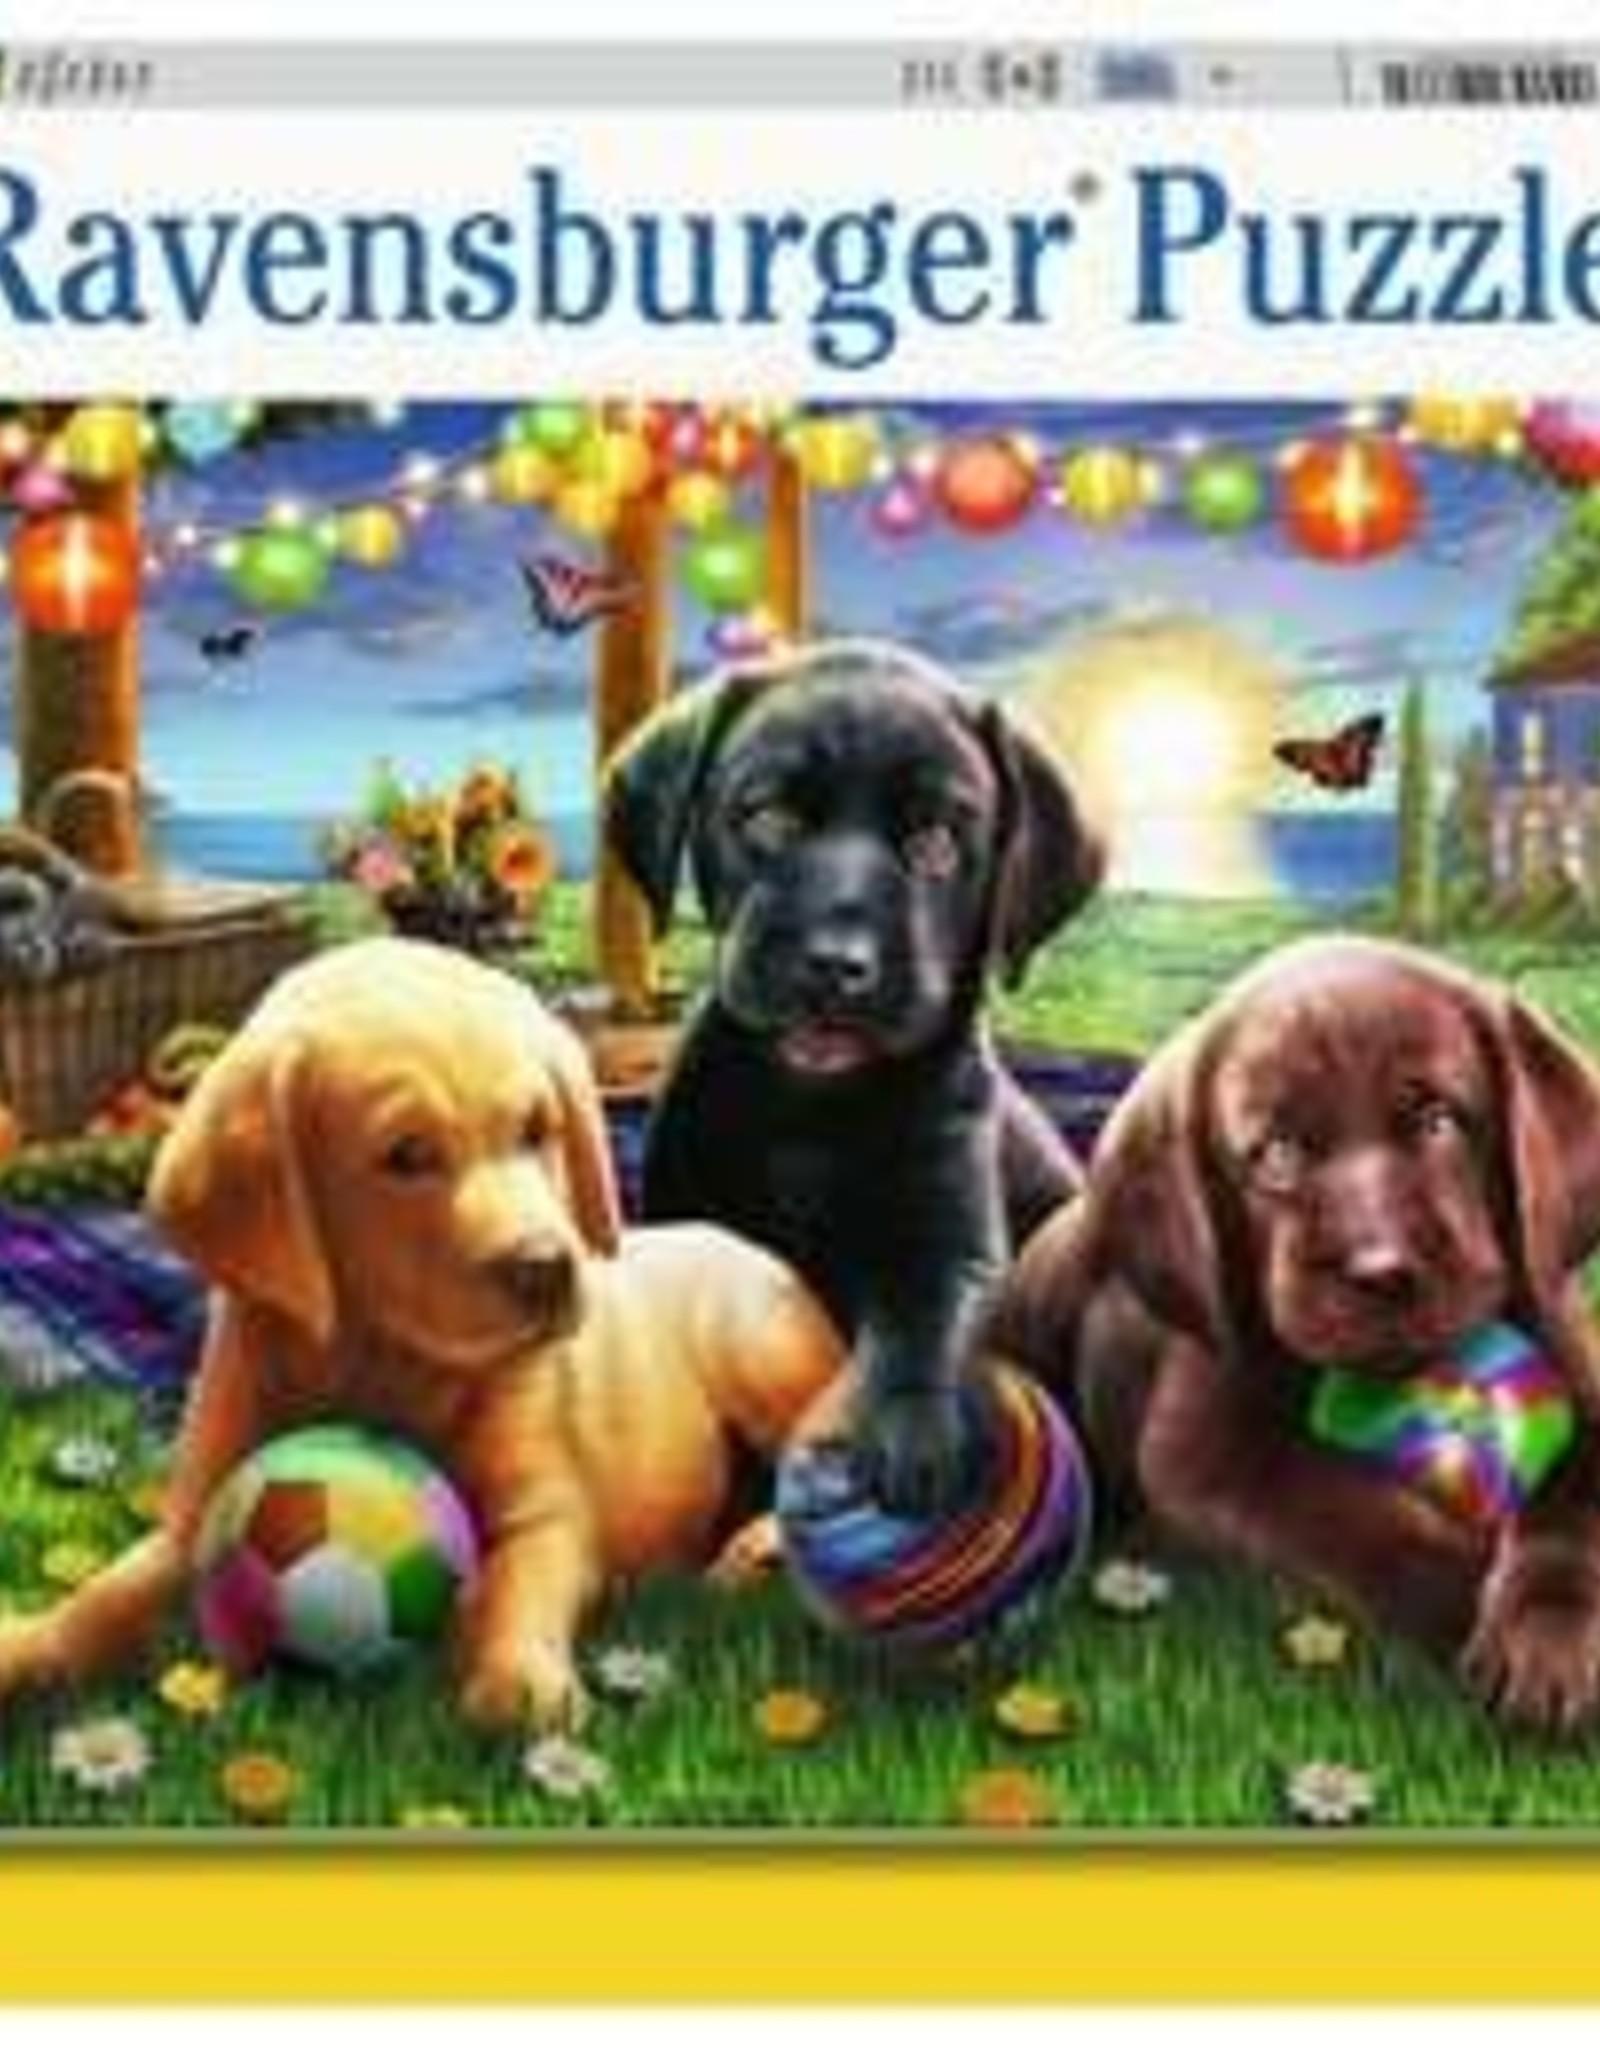 Ravensburger Puppy Picnic 100pc